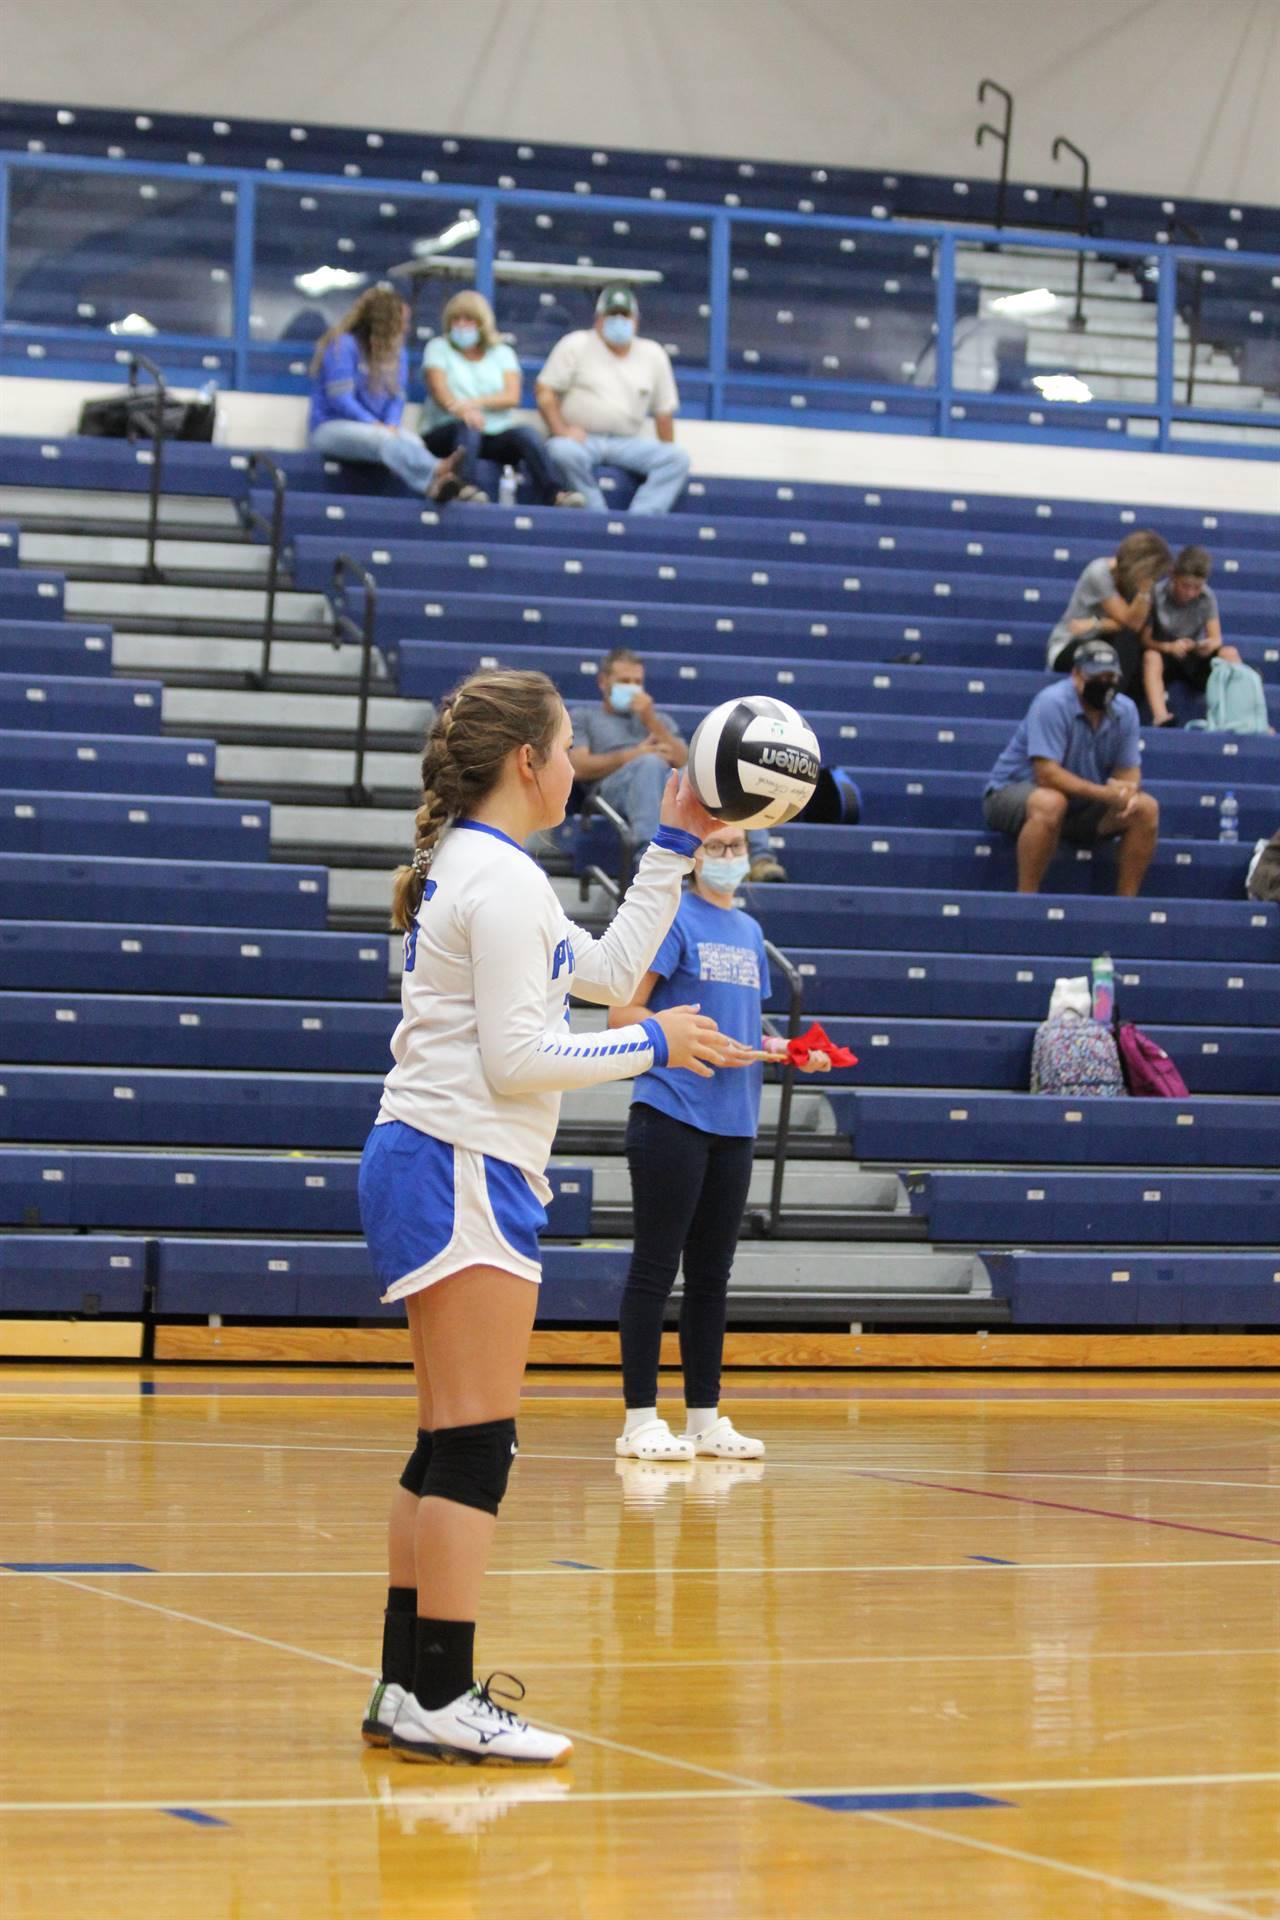 JH Girls vs Piketon Volleyball